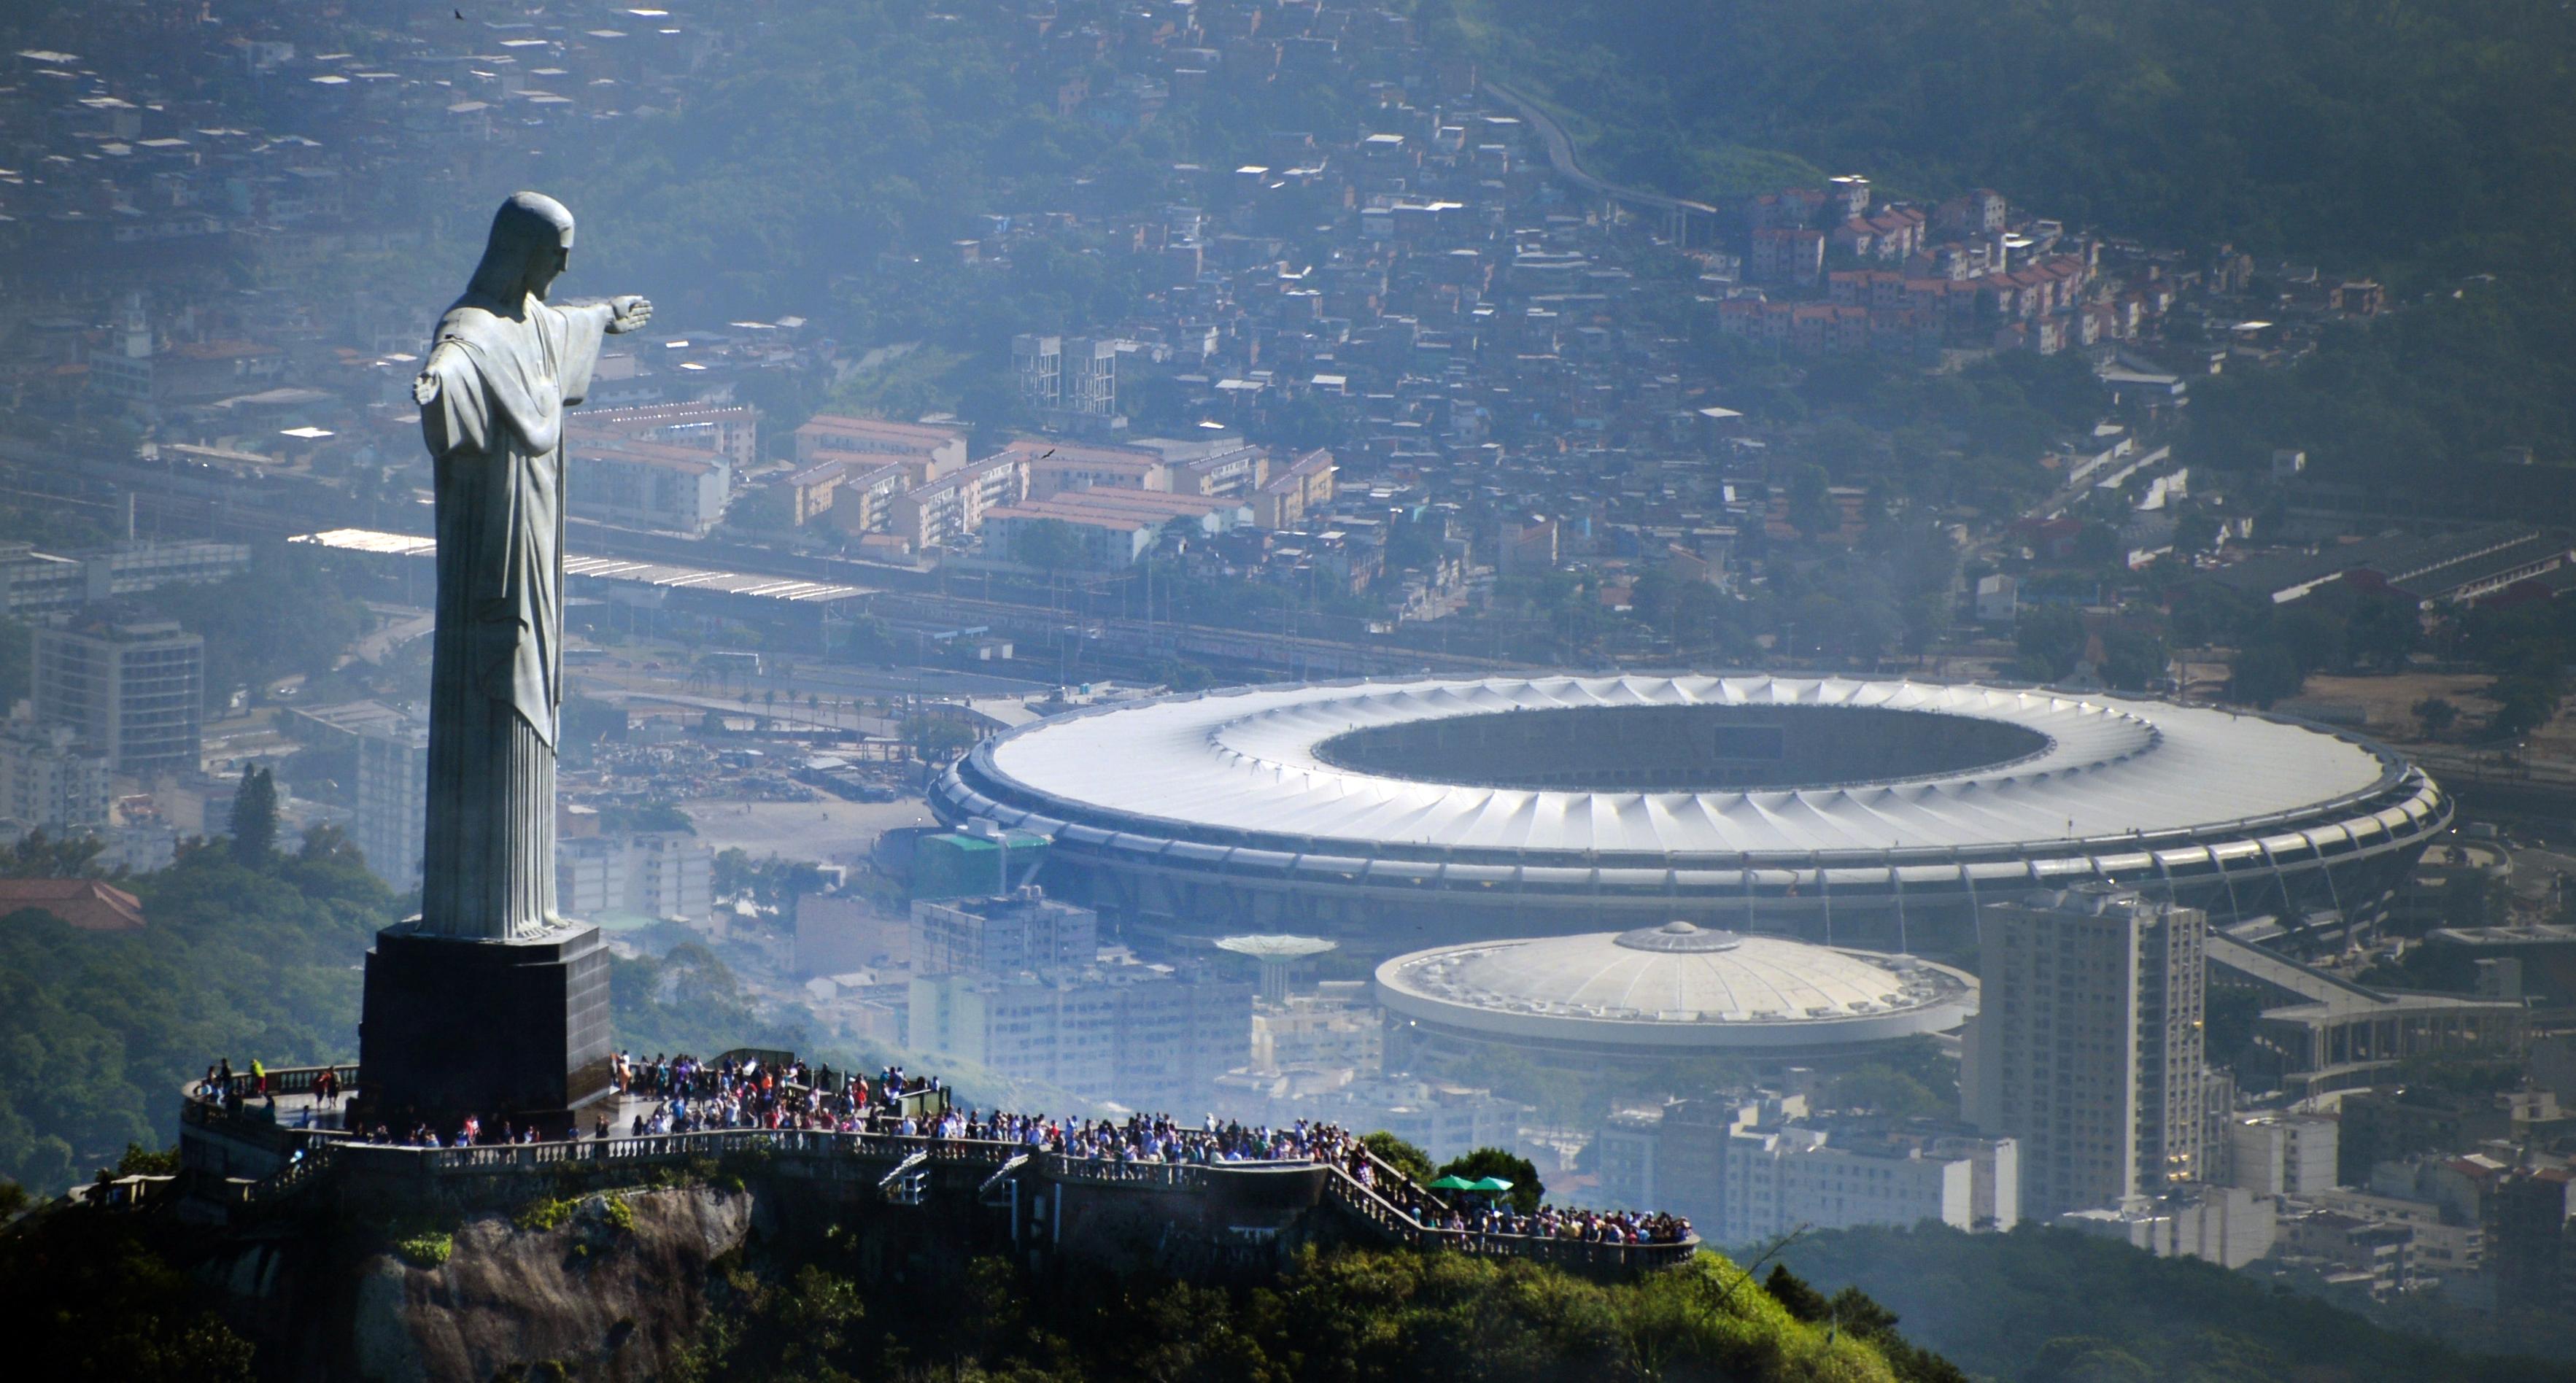 BrazilSurvey Rio Maracana